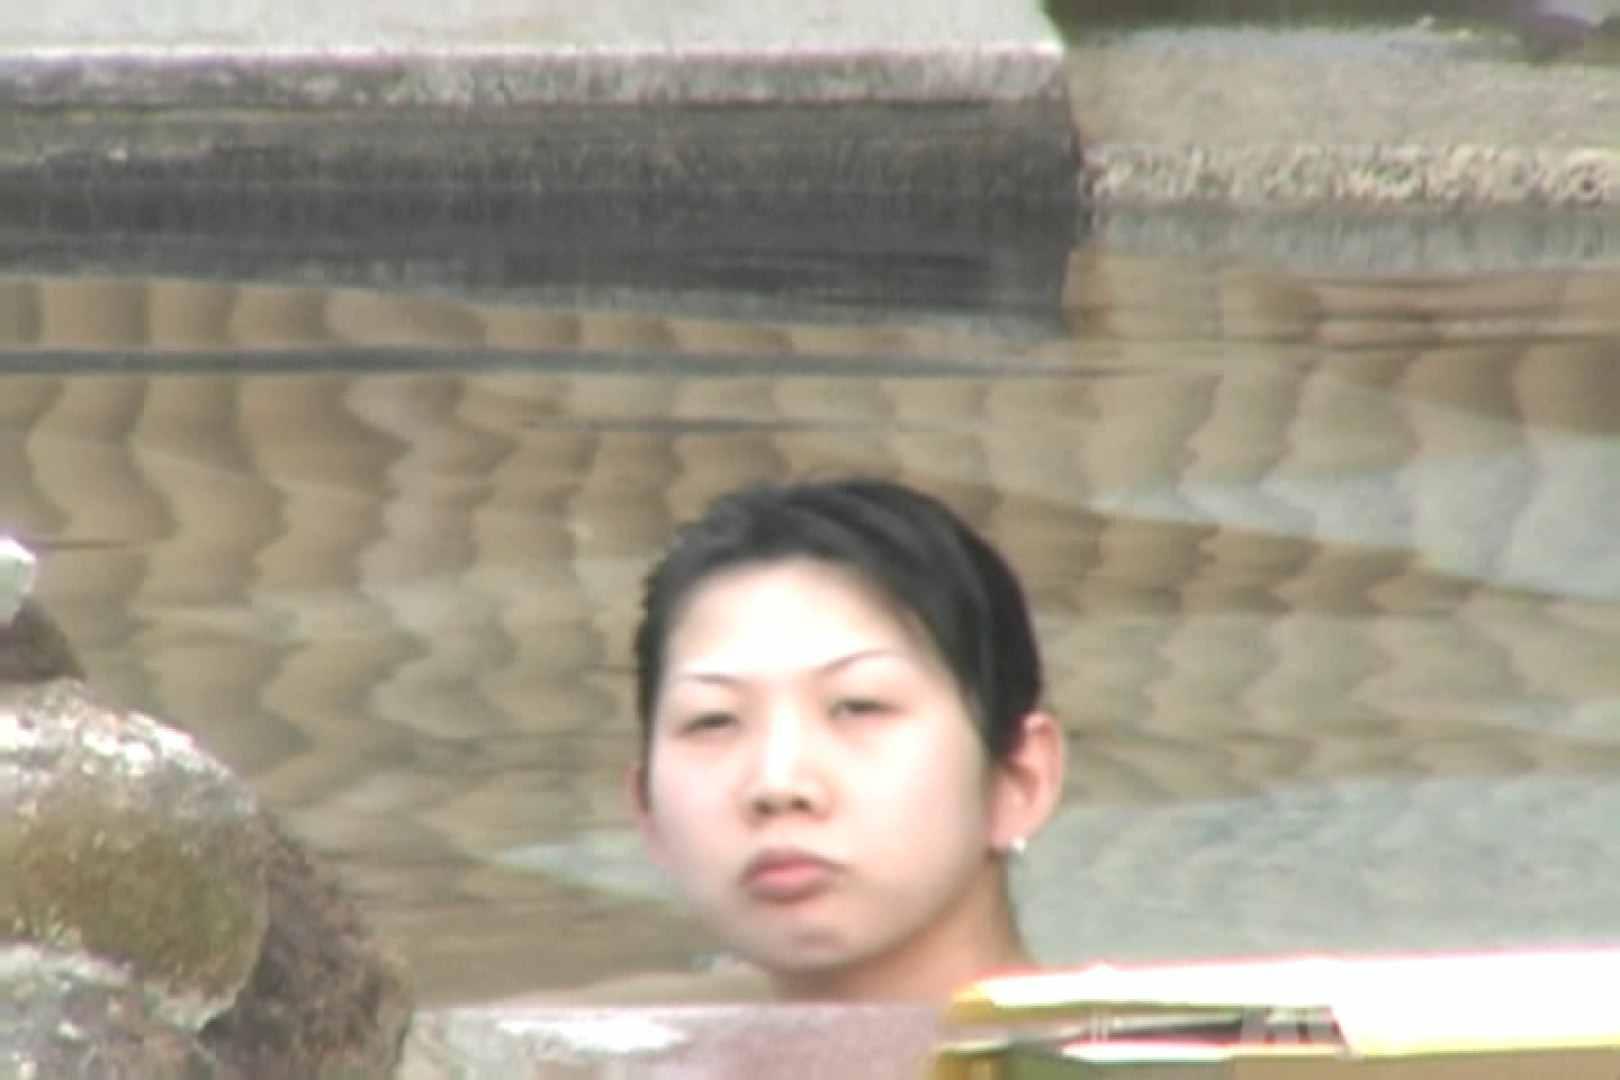 Aquaな露天風呂Vol.850 盗撮シリーズ | 露天風呂編  88PIX 65